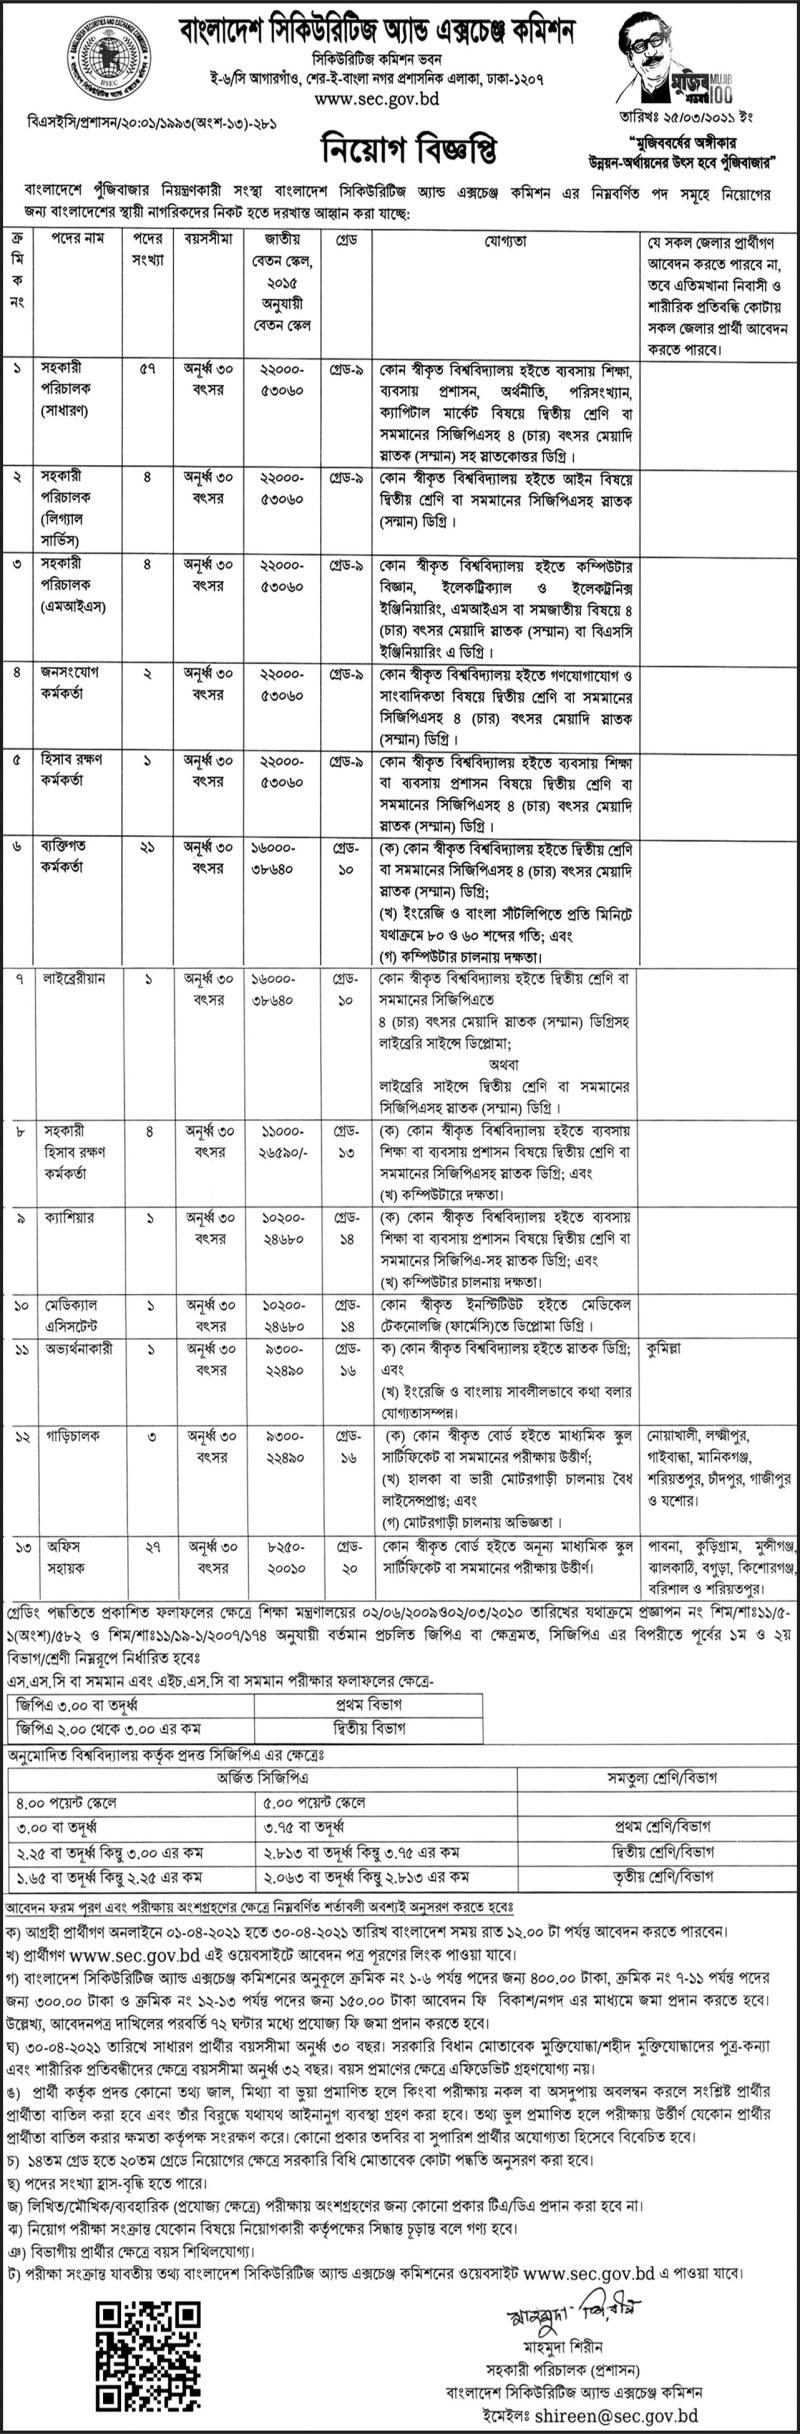 Bangladesh Securities and Exchange Commission SEC Job Circular 2021